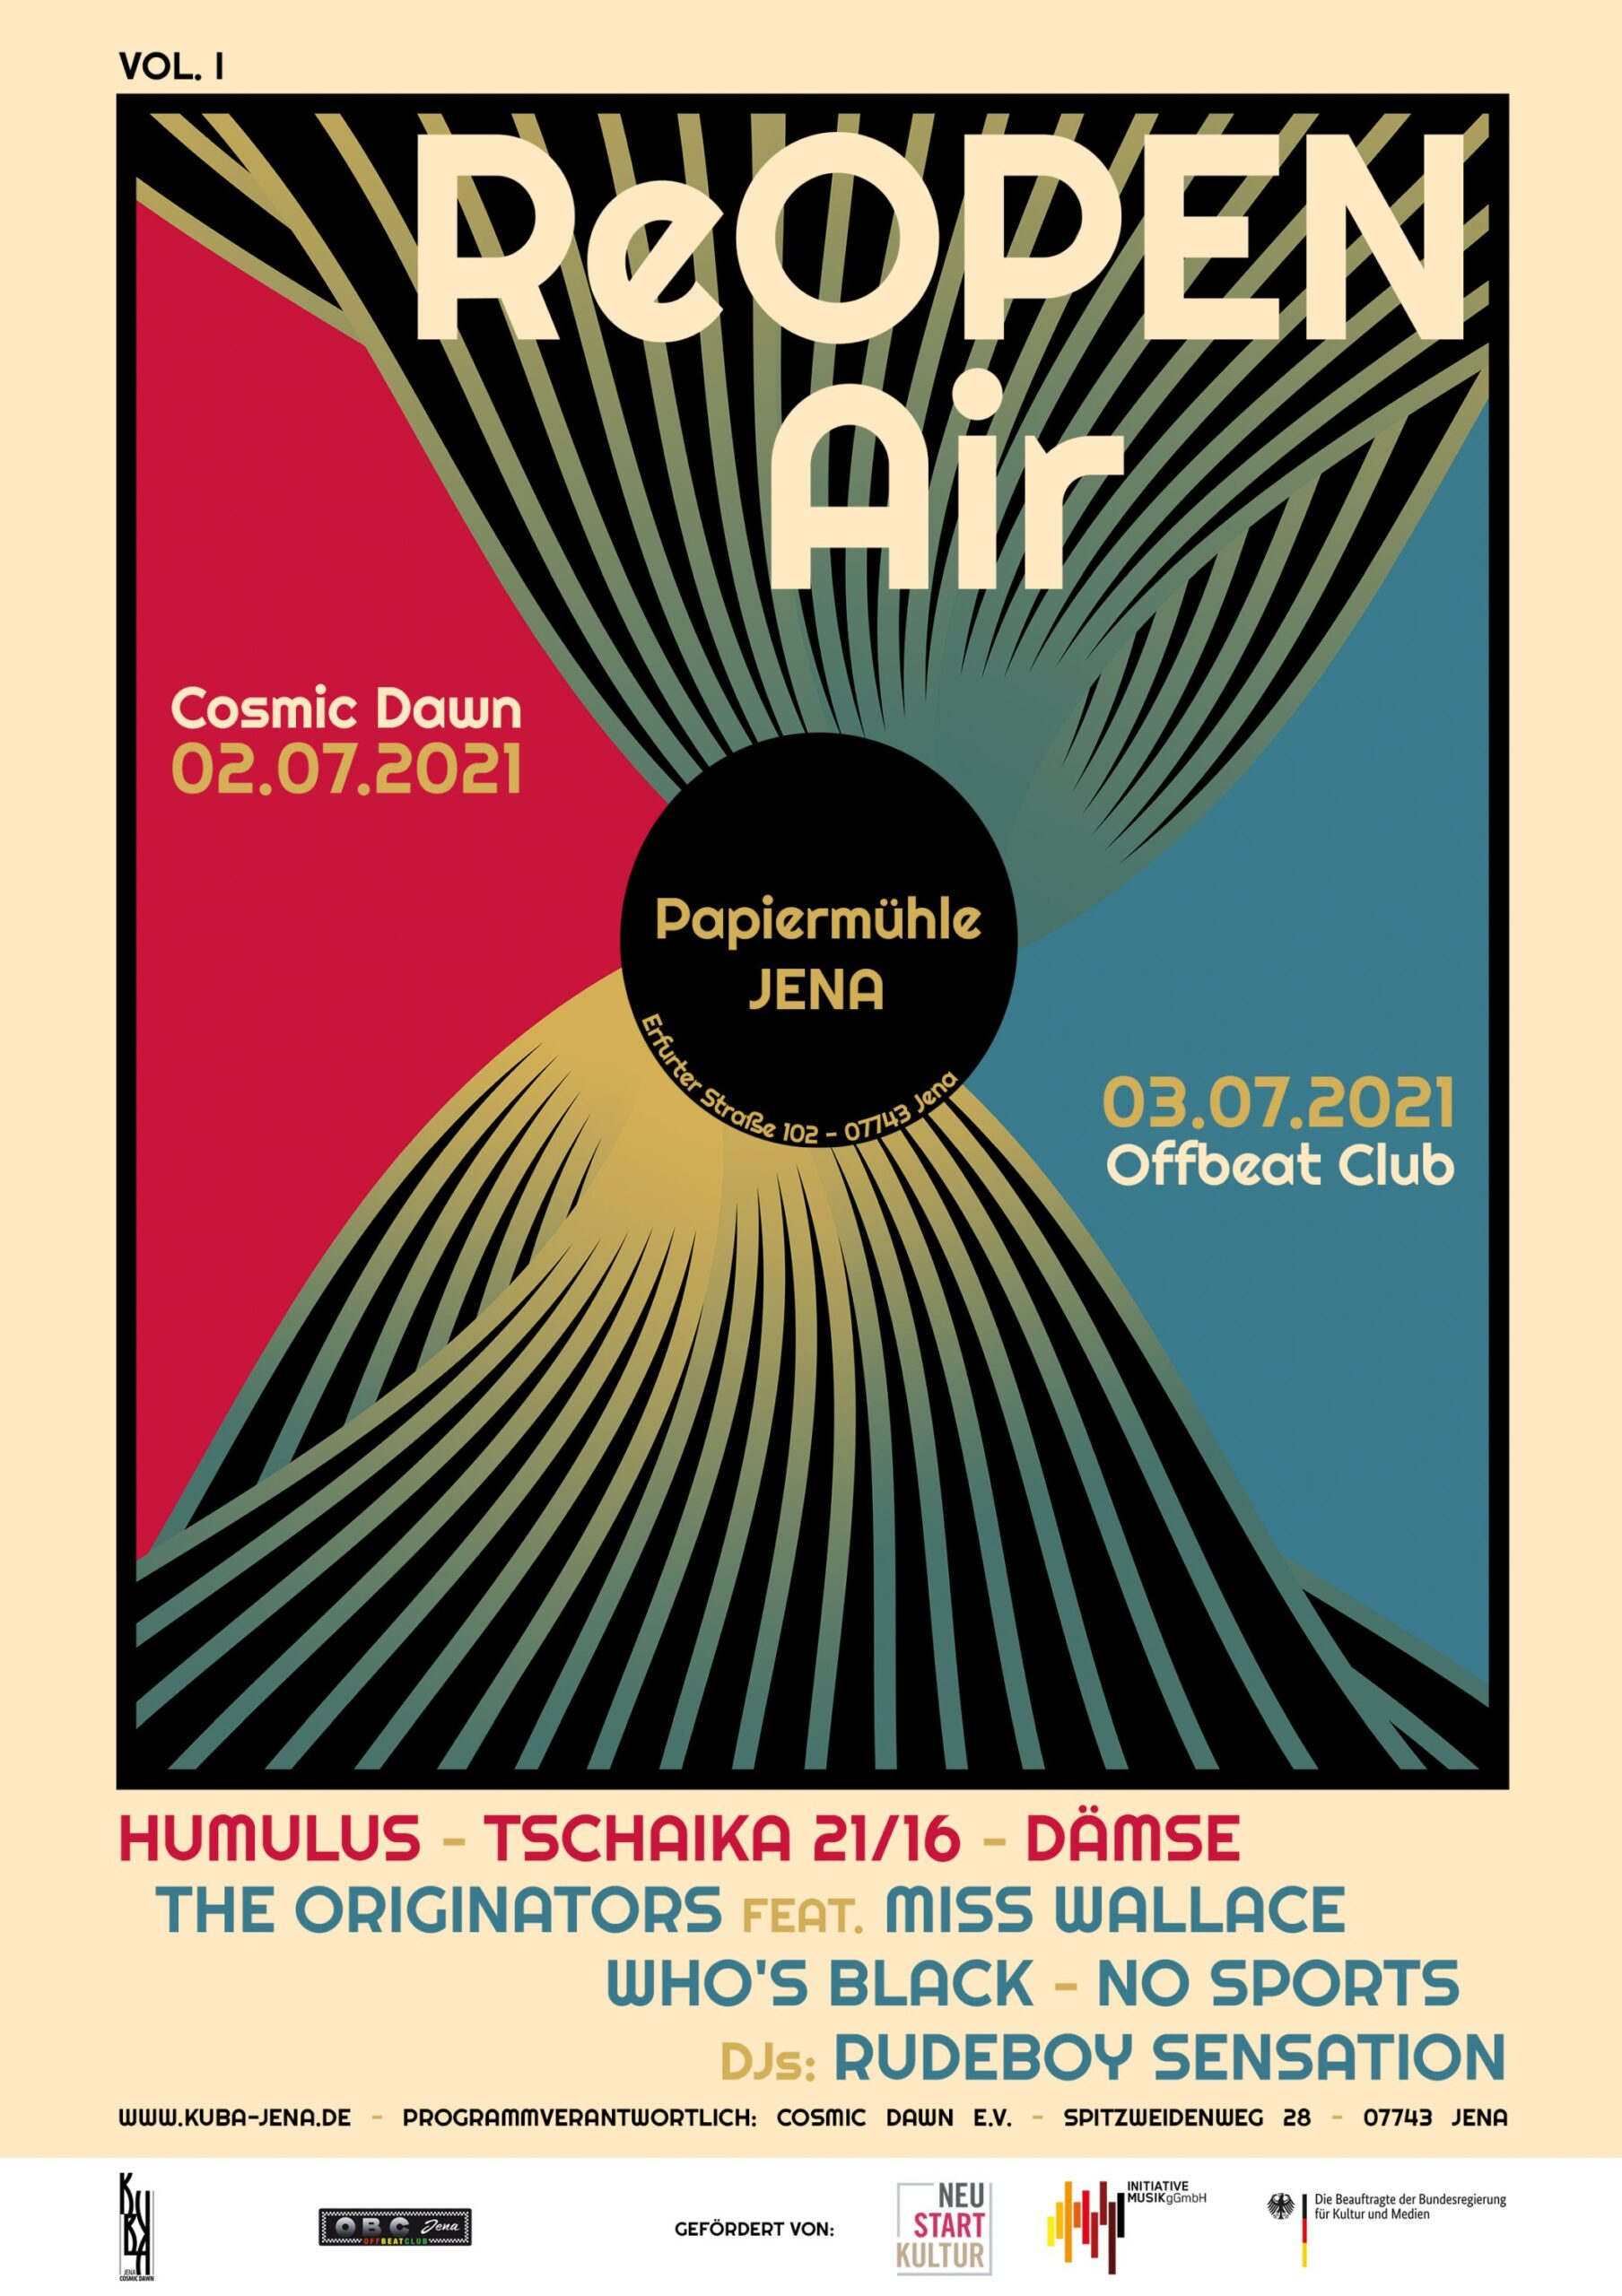 Offbeat Club Jena, Cosmic Dawn